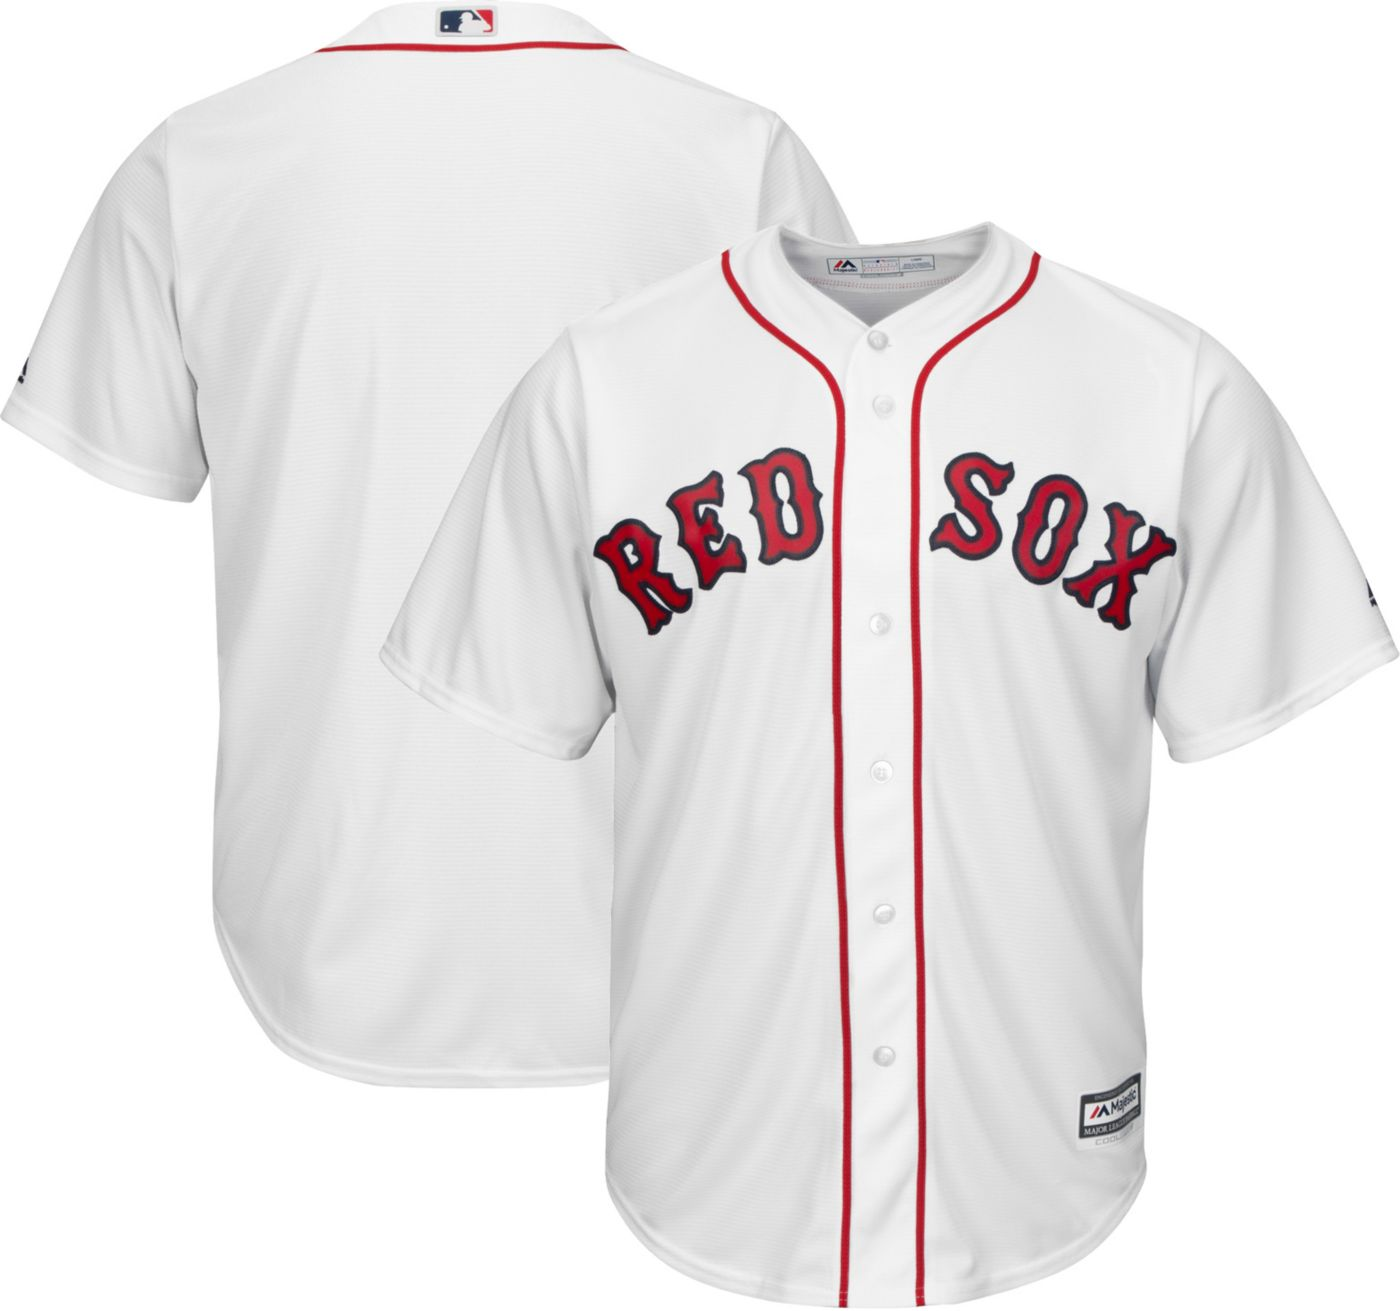 Majestic Men's Replica Boston Red Sox Cool Base Home White Jersey